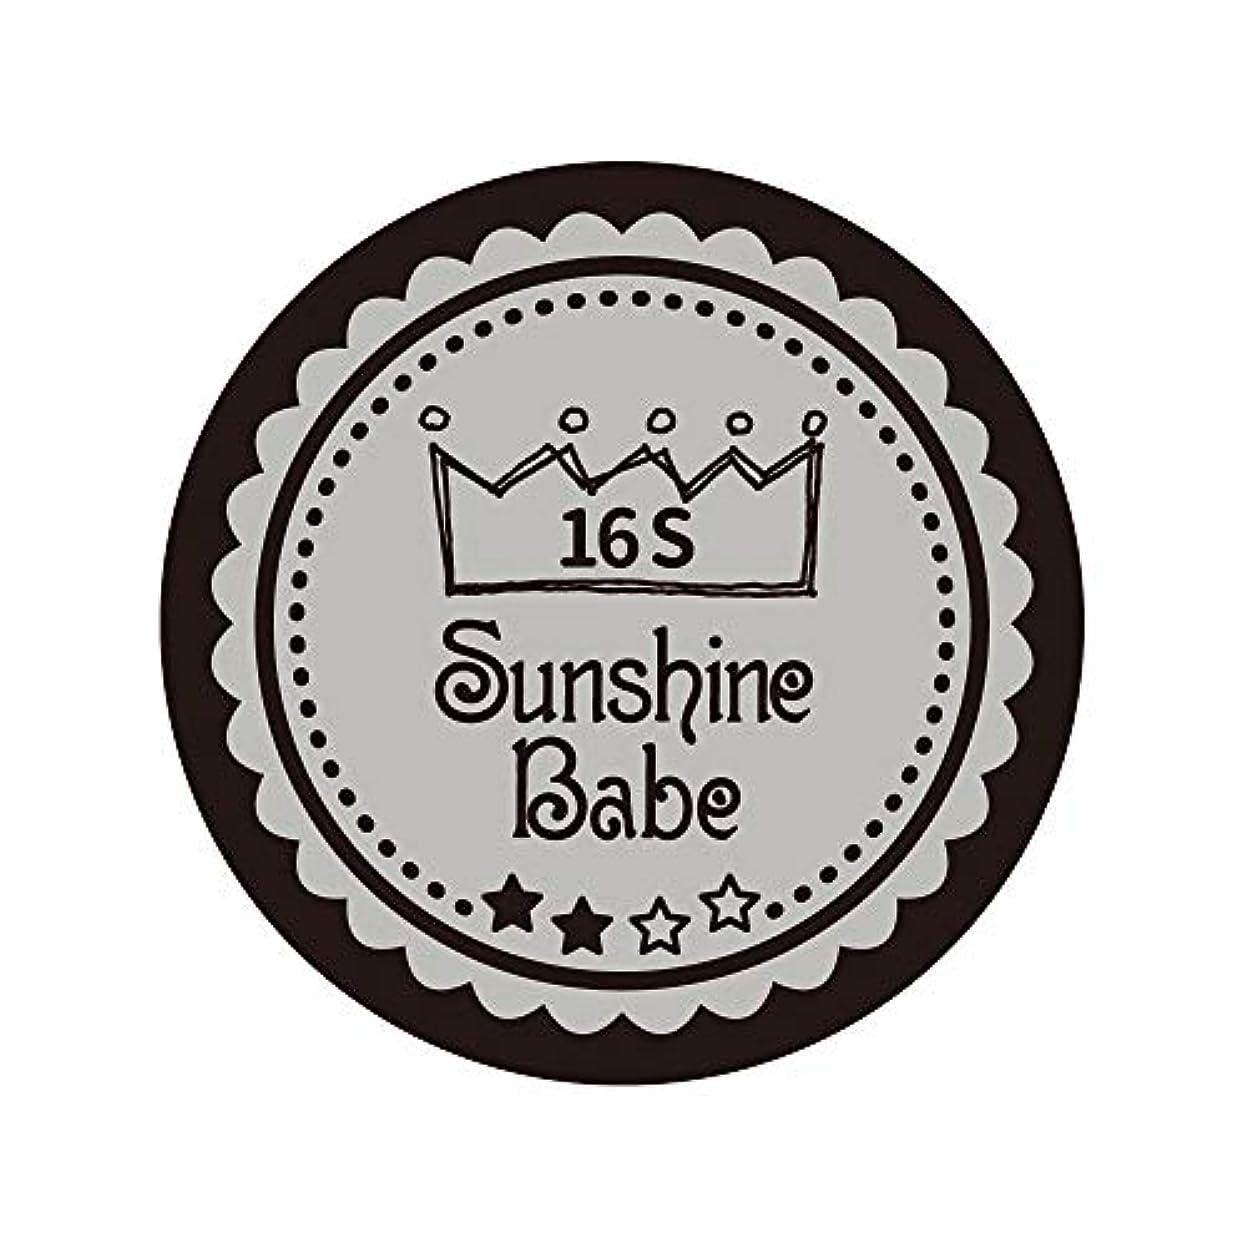 Sunshine Babe カラージェル 16S ハーバーミスト 2.7g UV/LED対応